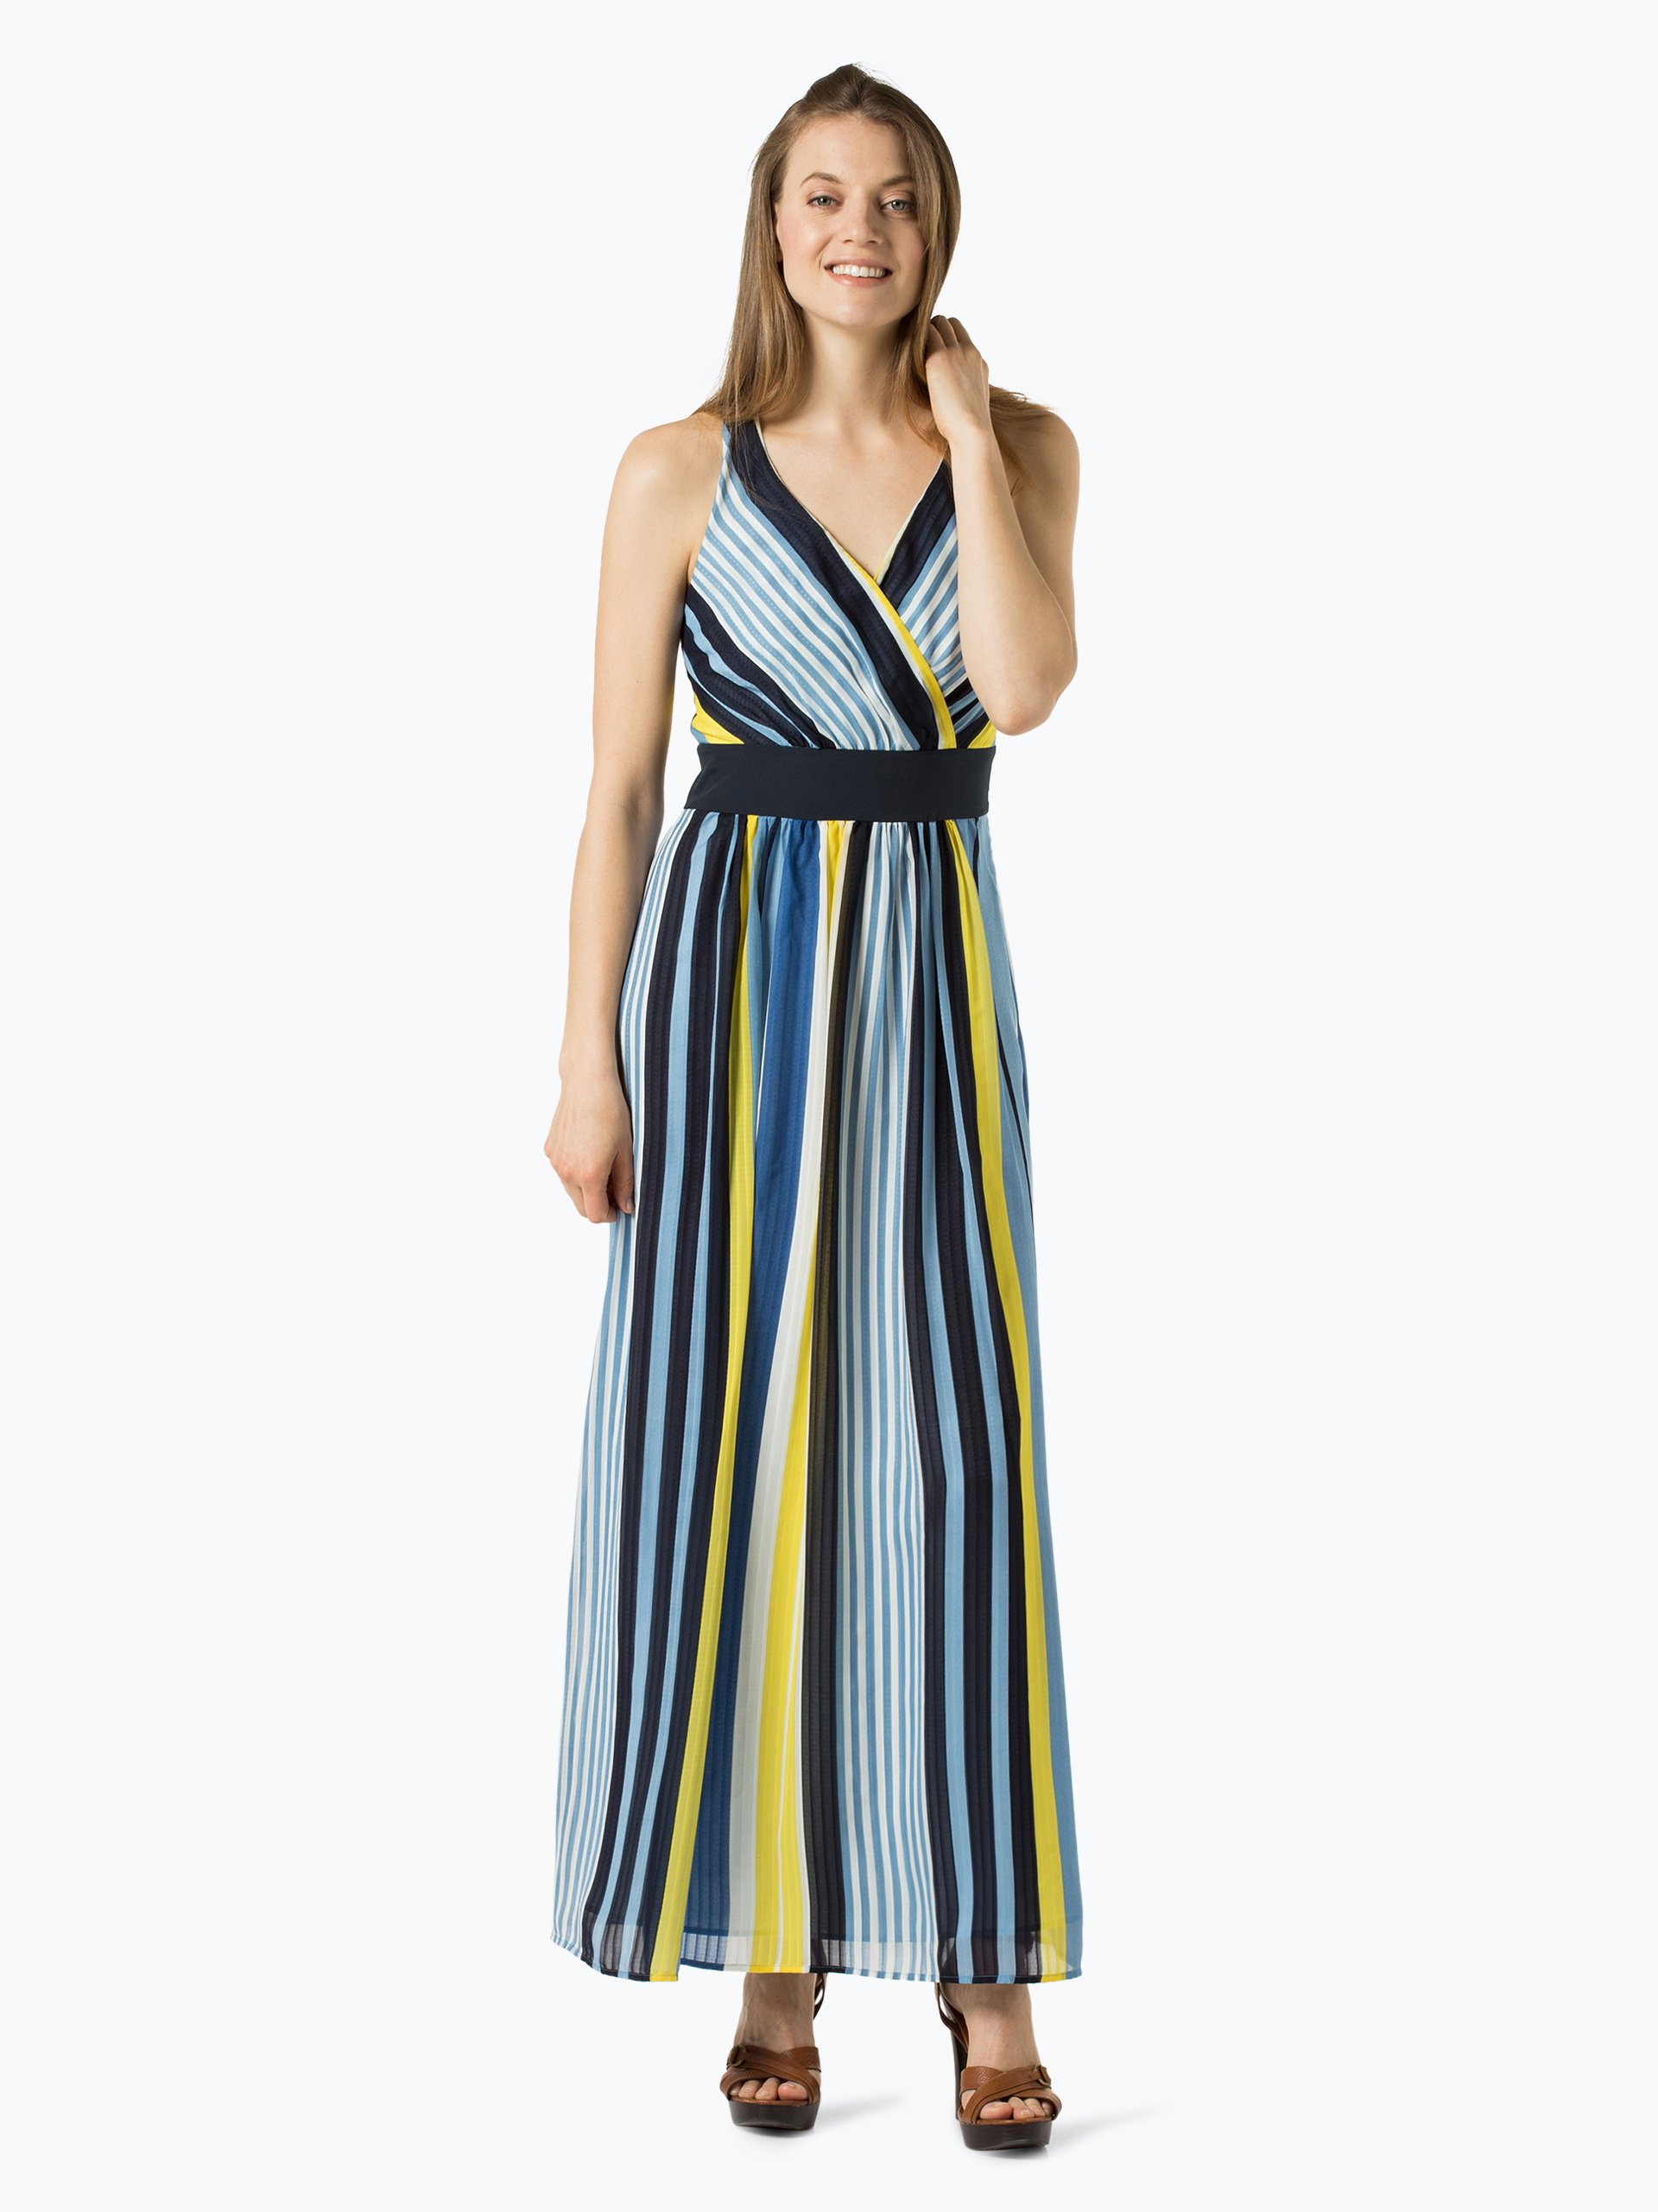 esprit collection damen kleid blau gelb gestreift online kaufen vangraaf com. Black Bedroom Furniture Sets. Home Design Ideas